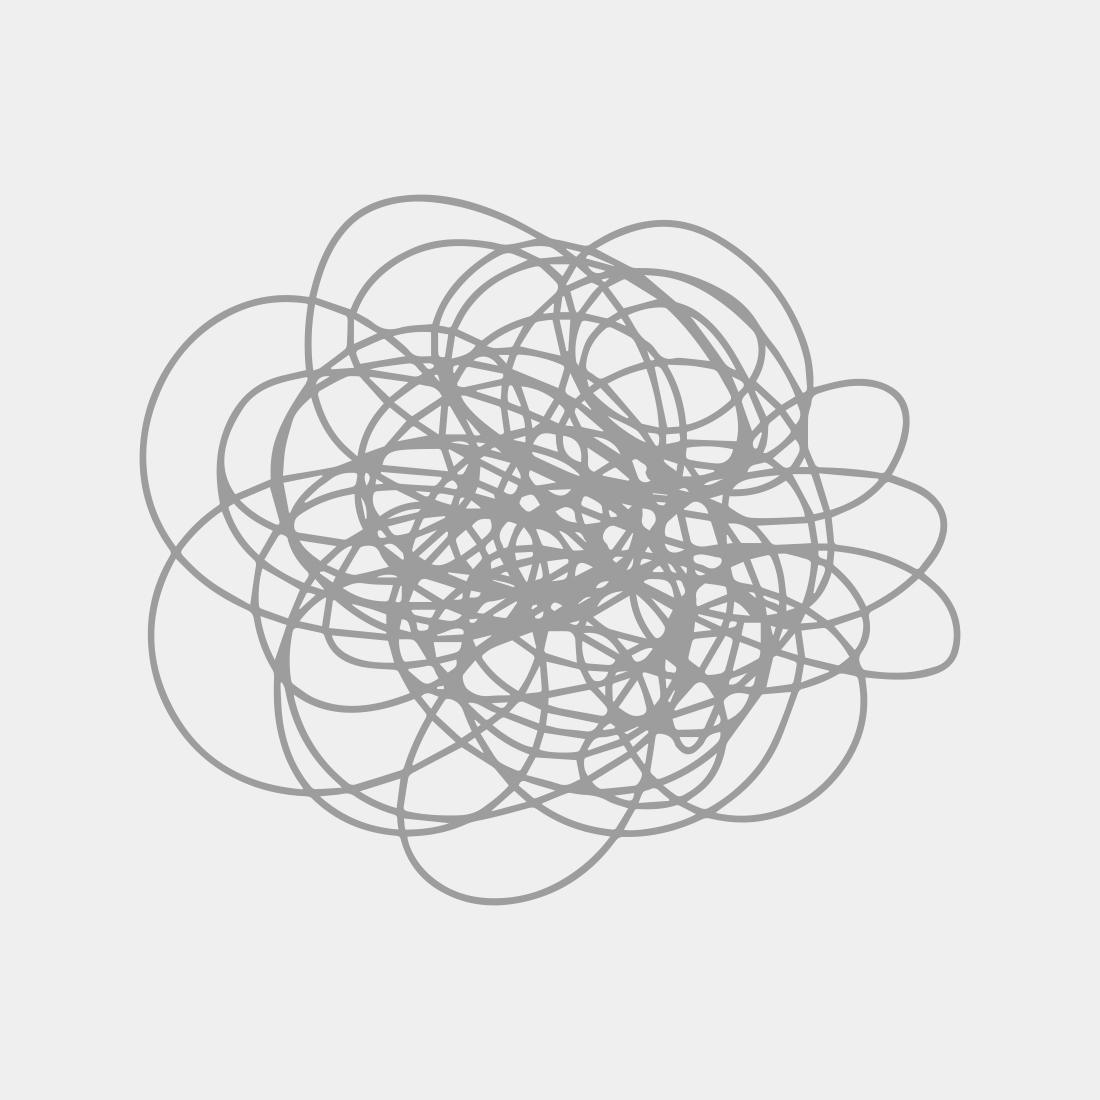 Albert Irvin OBE RA Untitled opus w.42